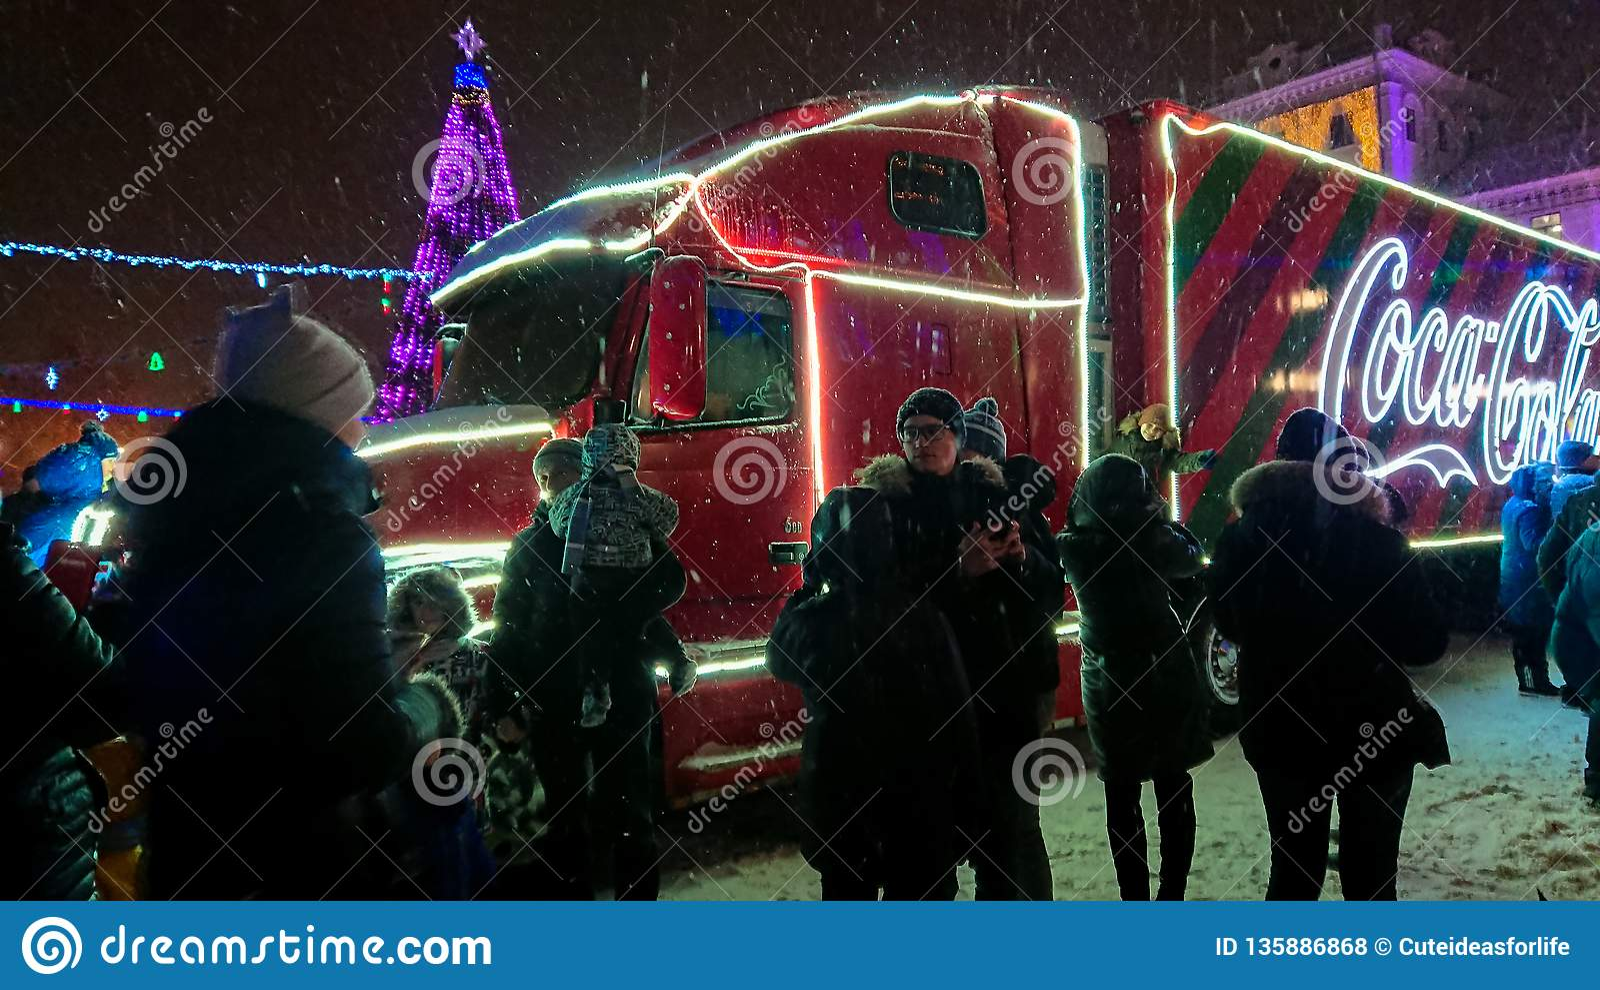 Ternopil Ukraine January 5 2019 Coca Cola Christmas